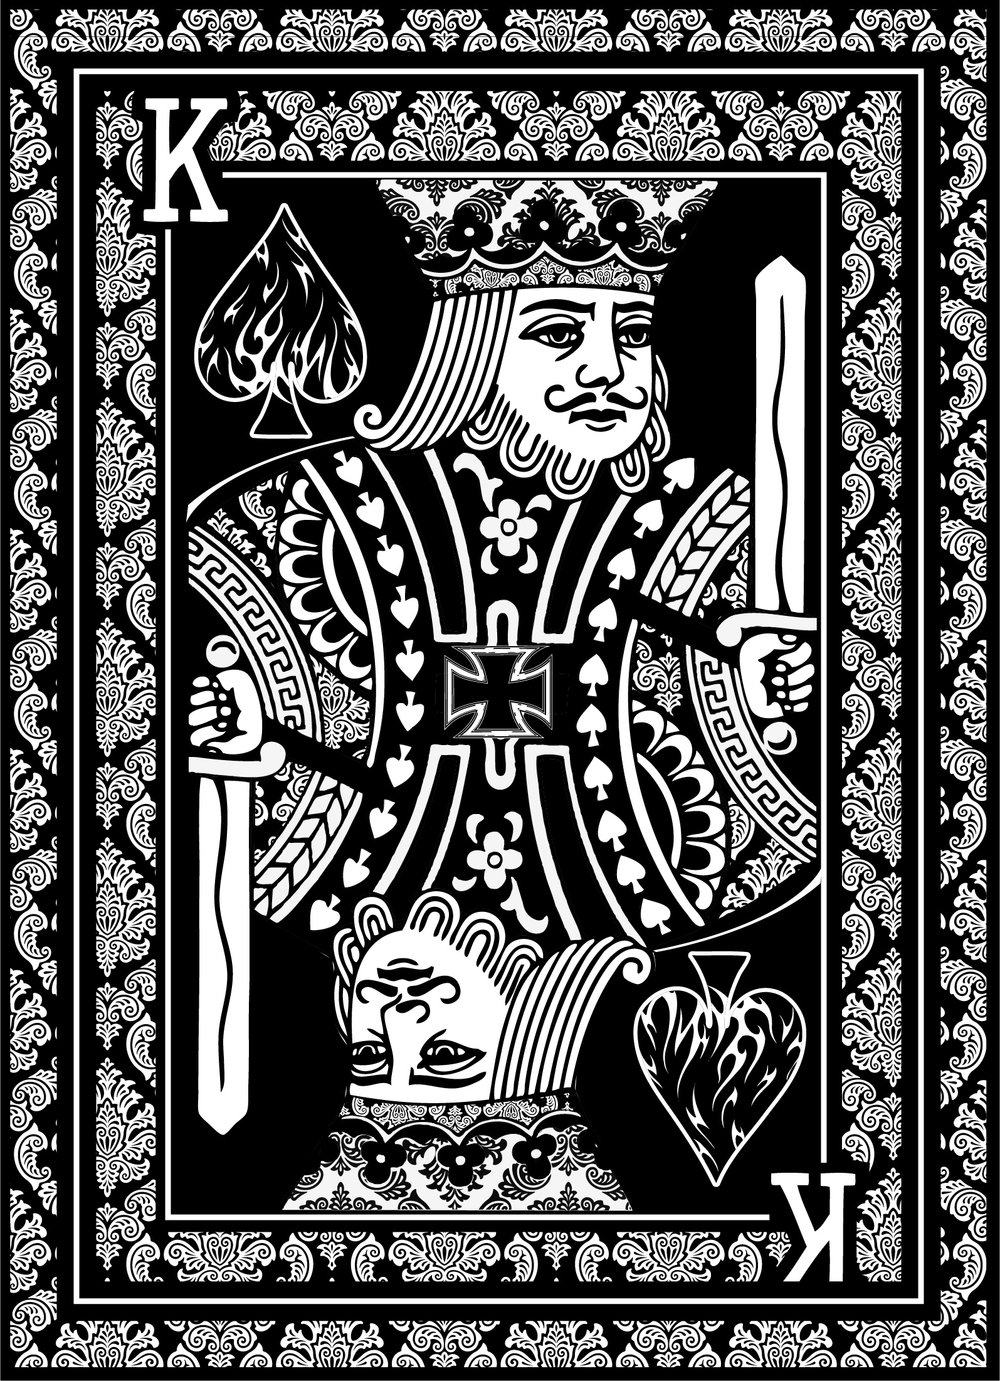 king@3x-80.jpg